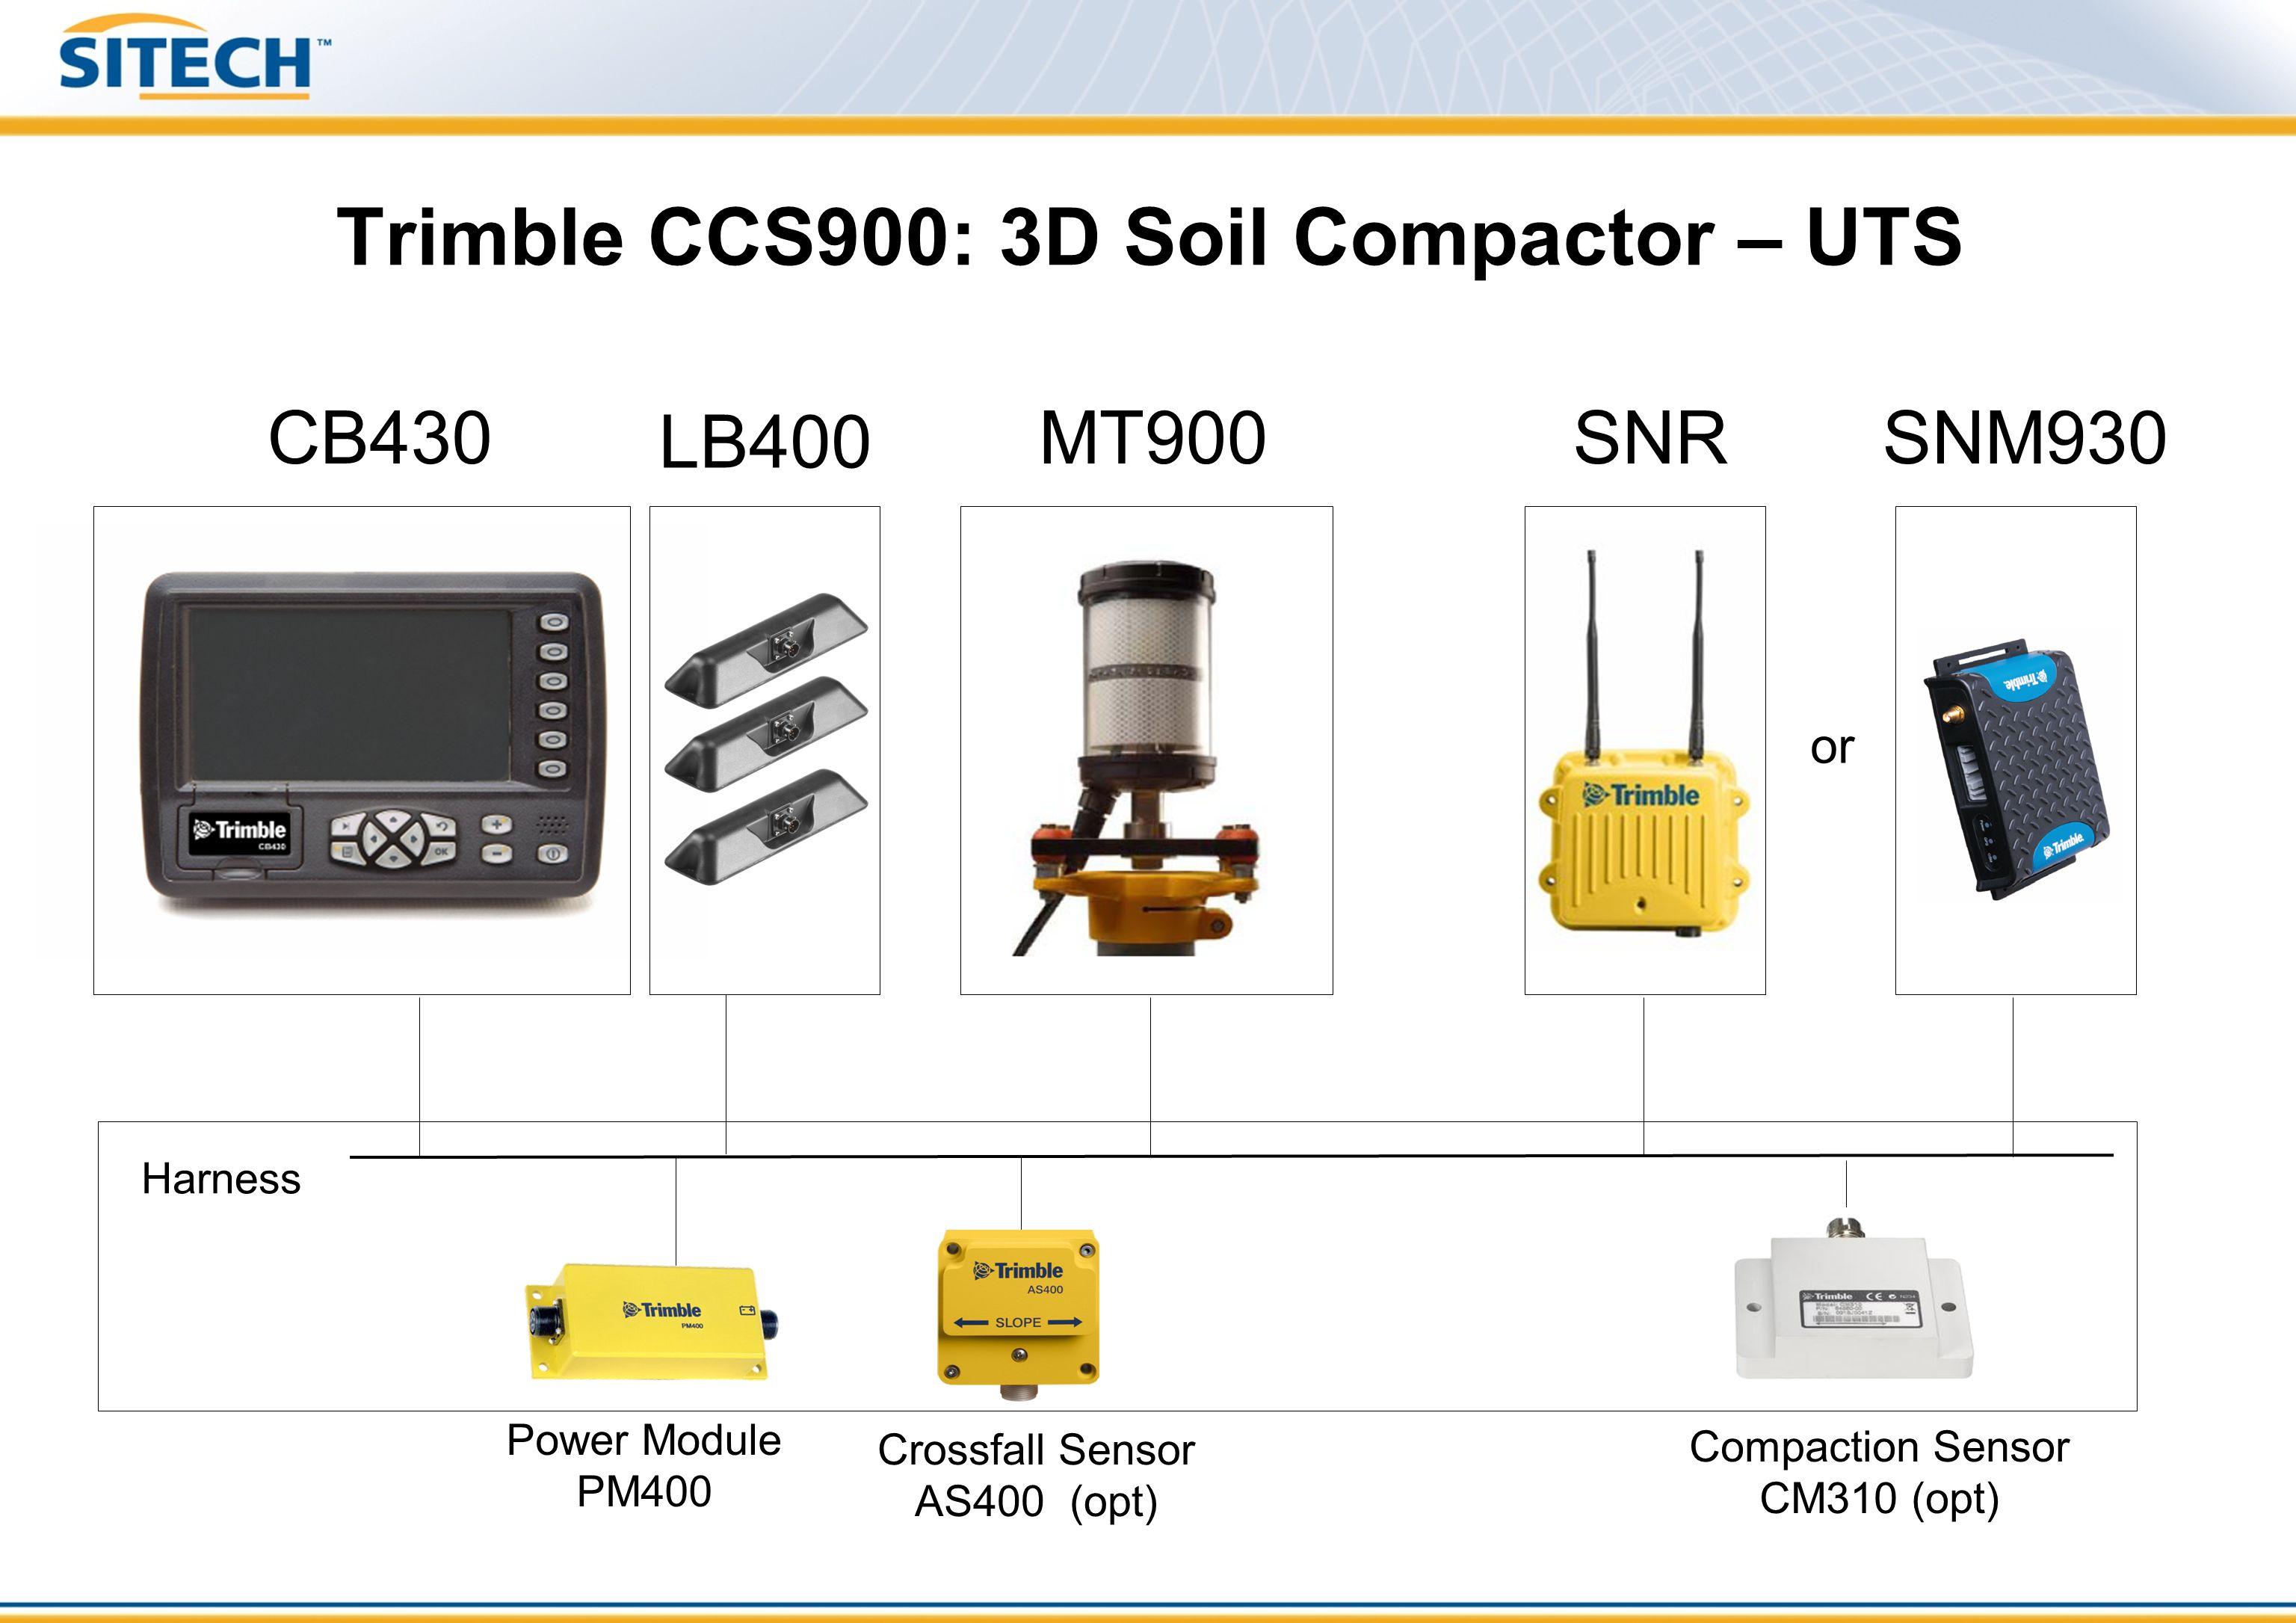 Trimble CCS900: 3D Soil Compactor – UTS